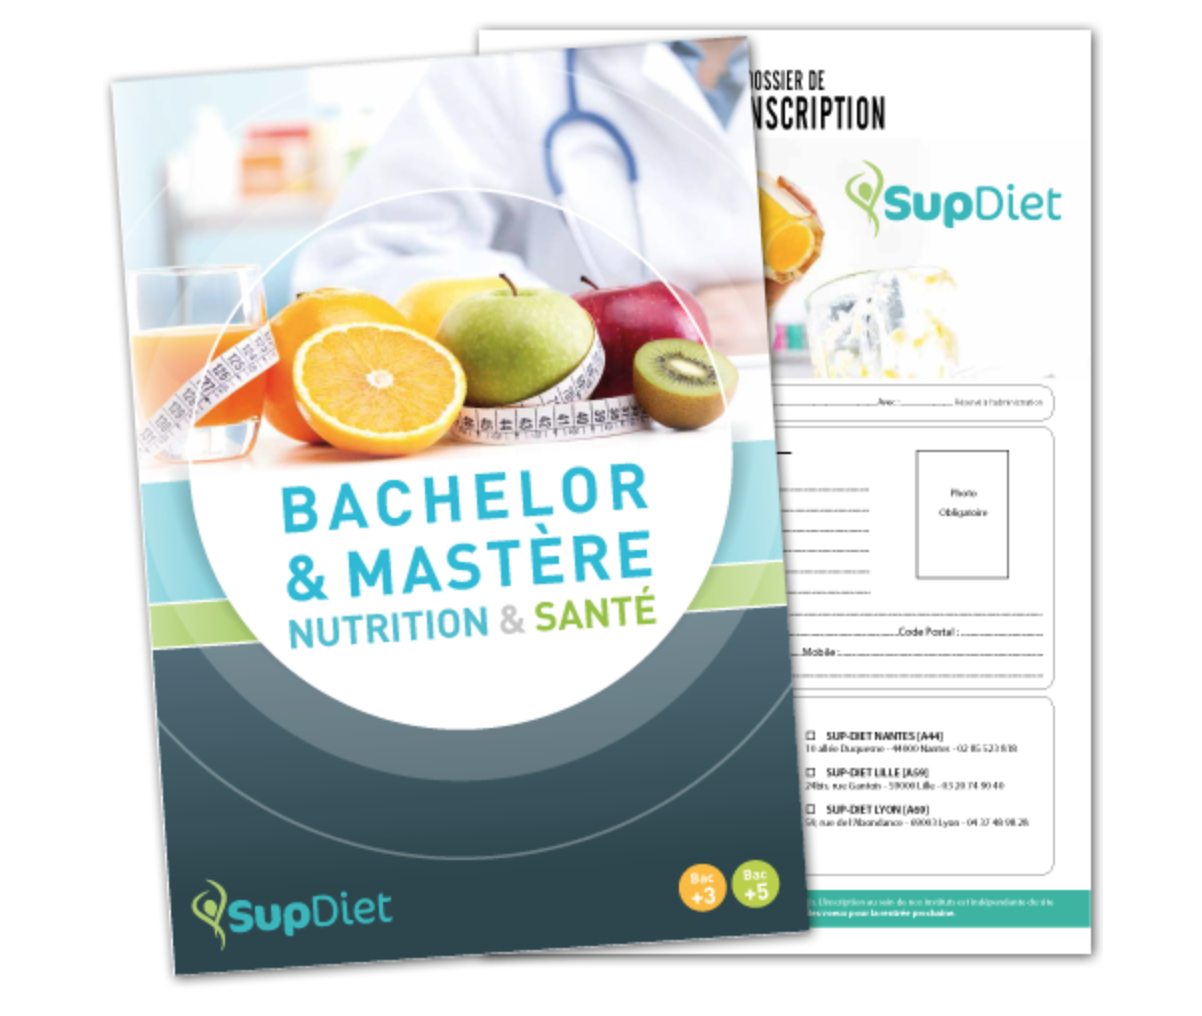 BACHELOR NUTRITION SANTE ADONIS